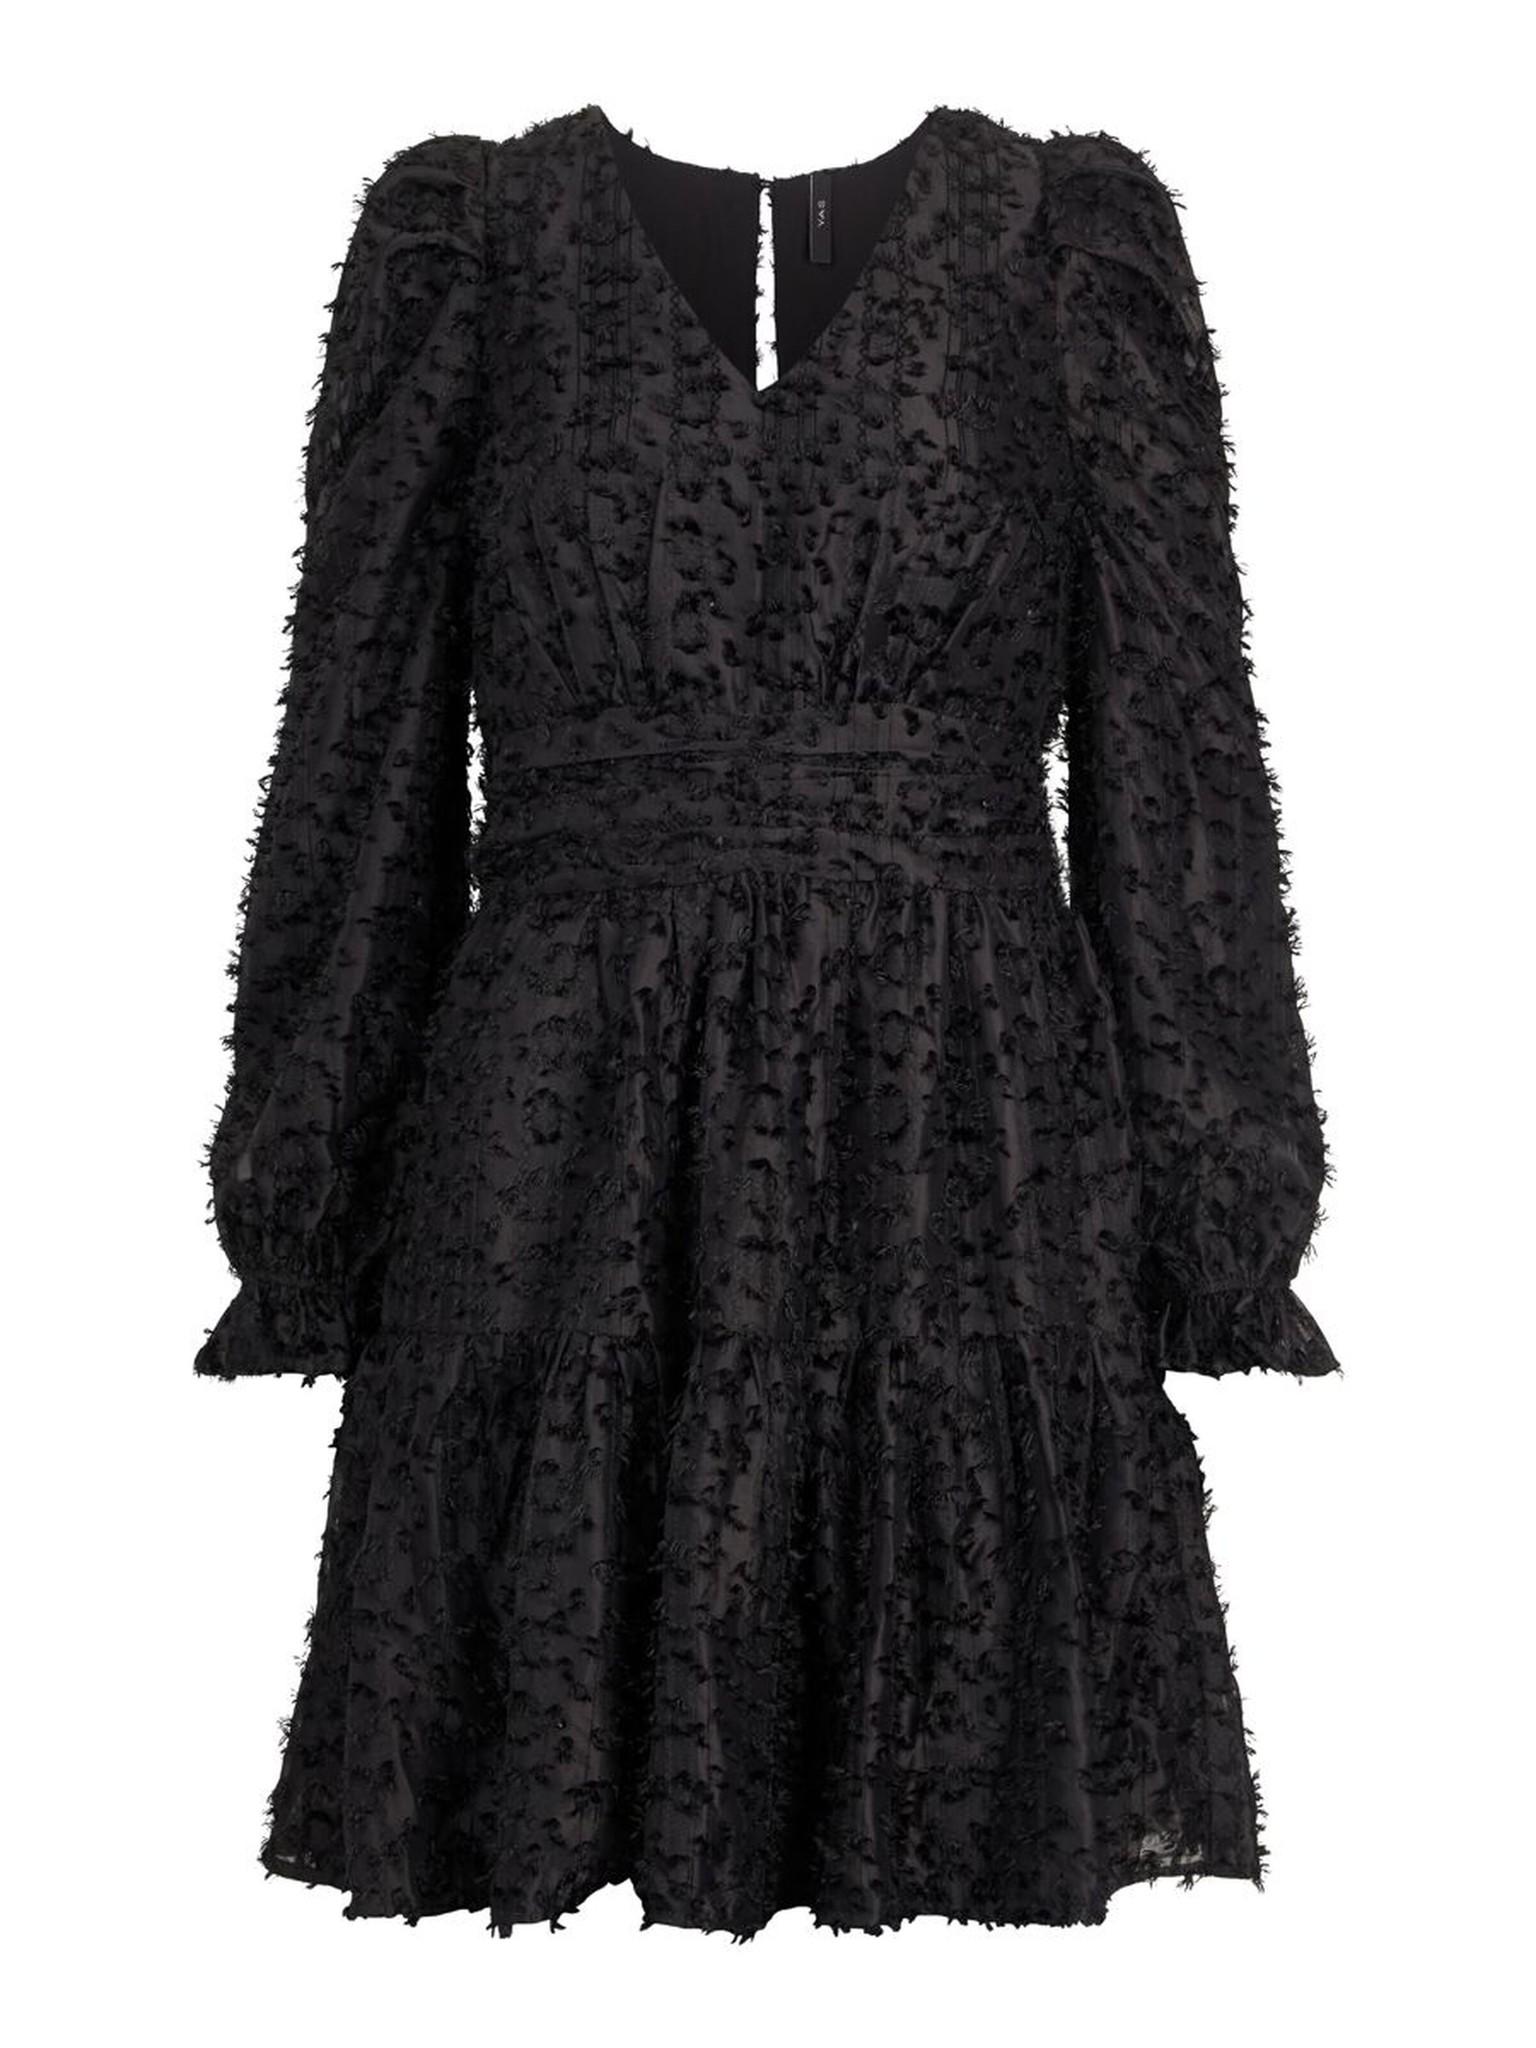 Jurk Vivian dress black-1